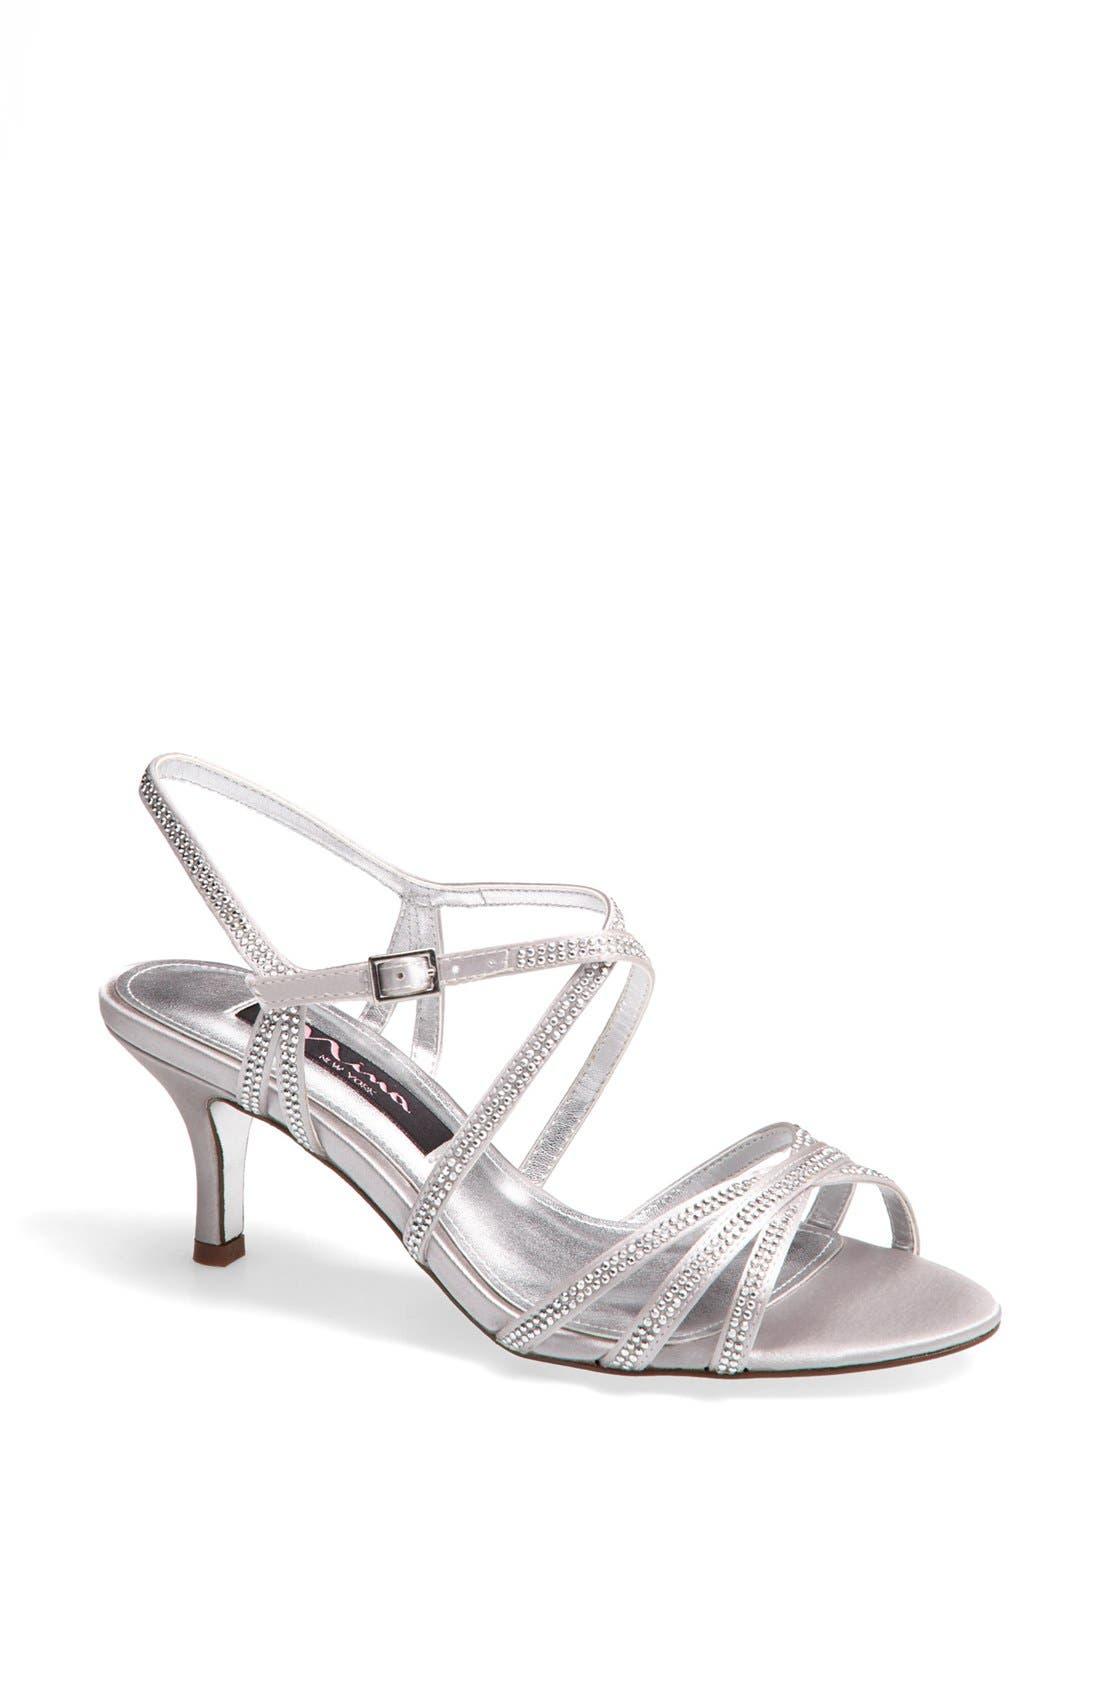 Main Image - Nina 'Caprese' Sandal